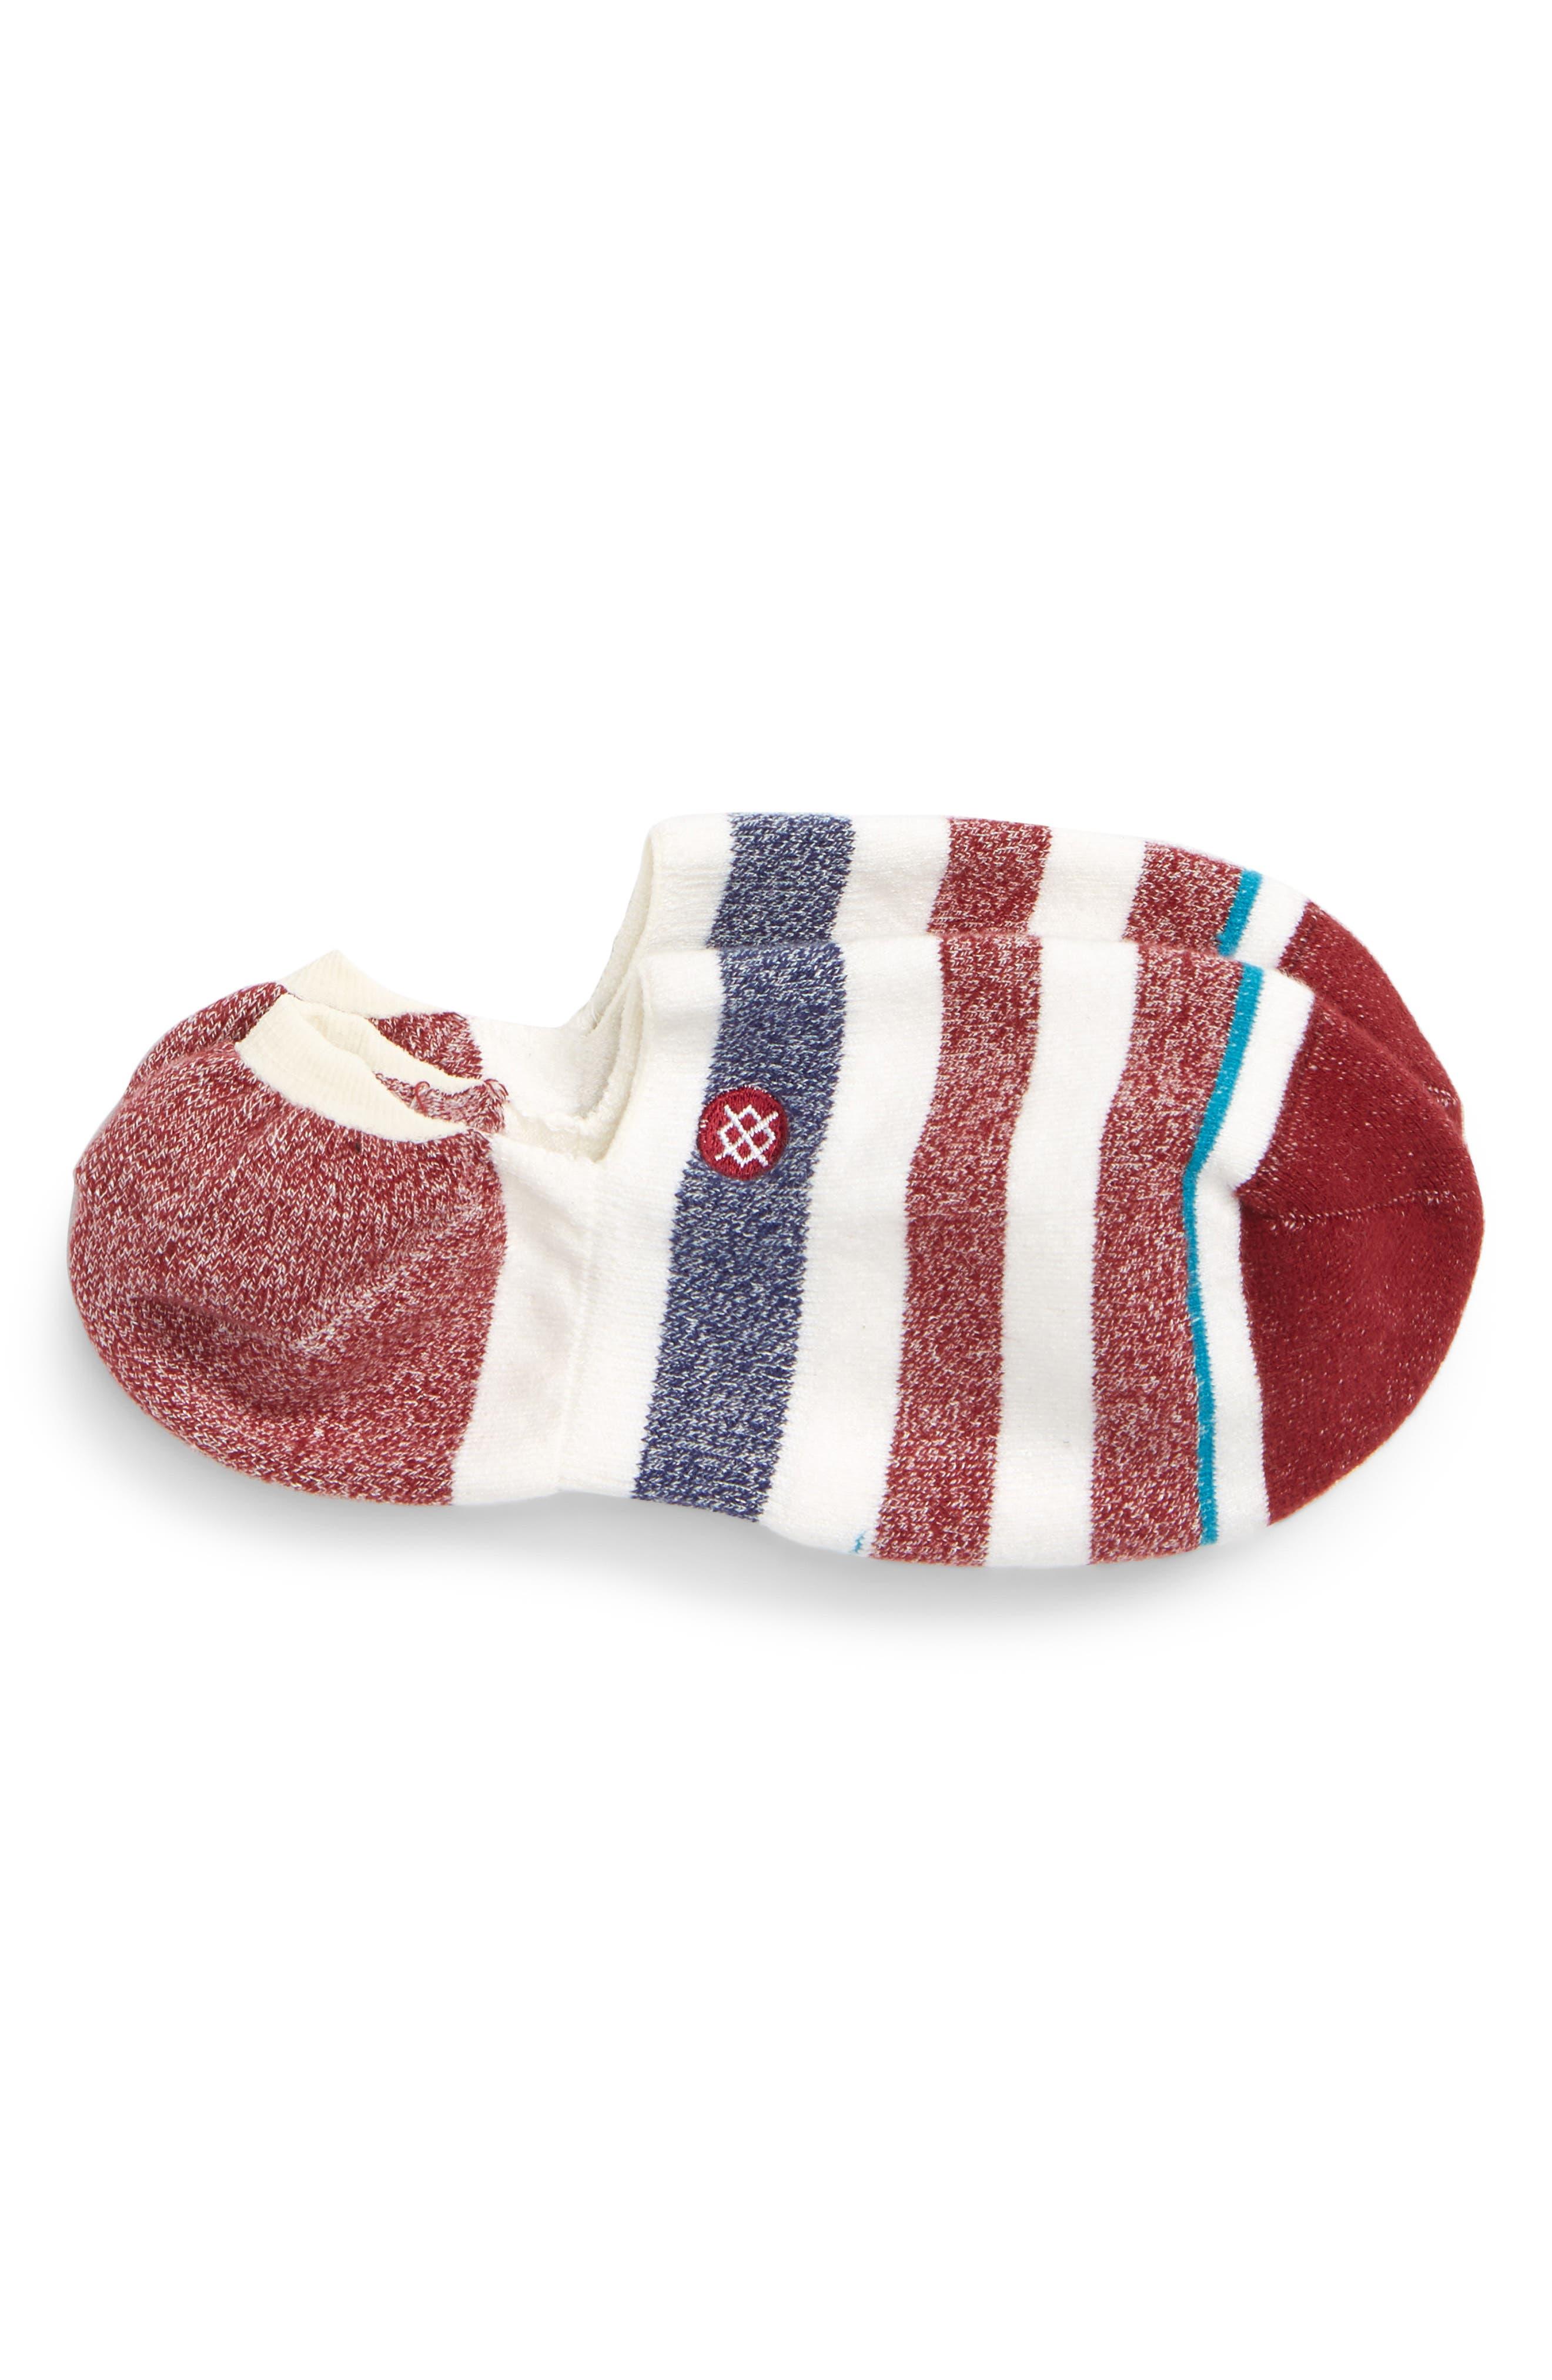 Robinsen Low Socks,                             Main thumbnail 1, color,                             RED